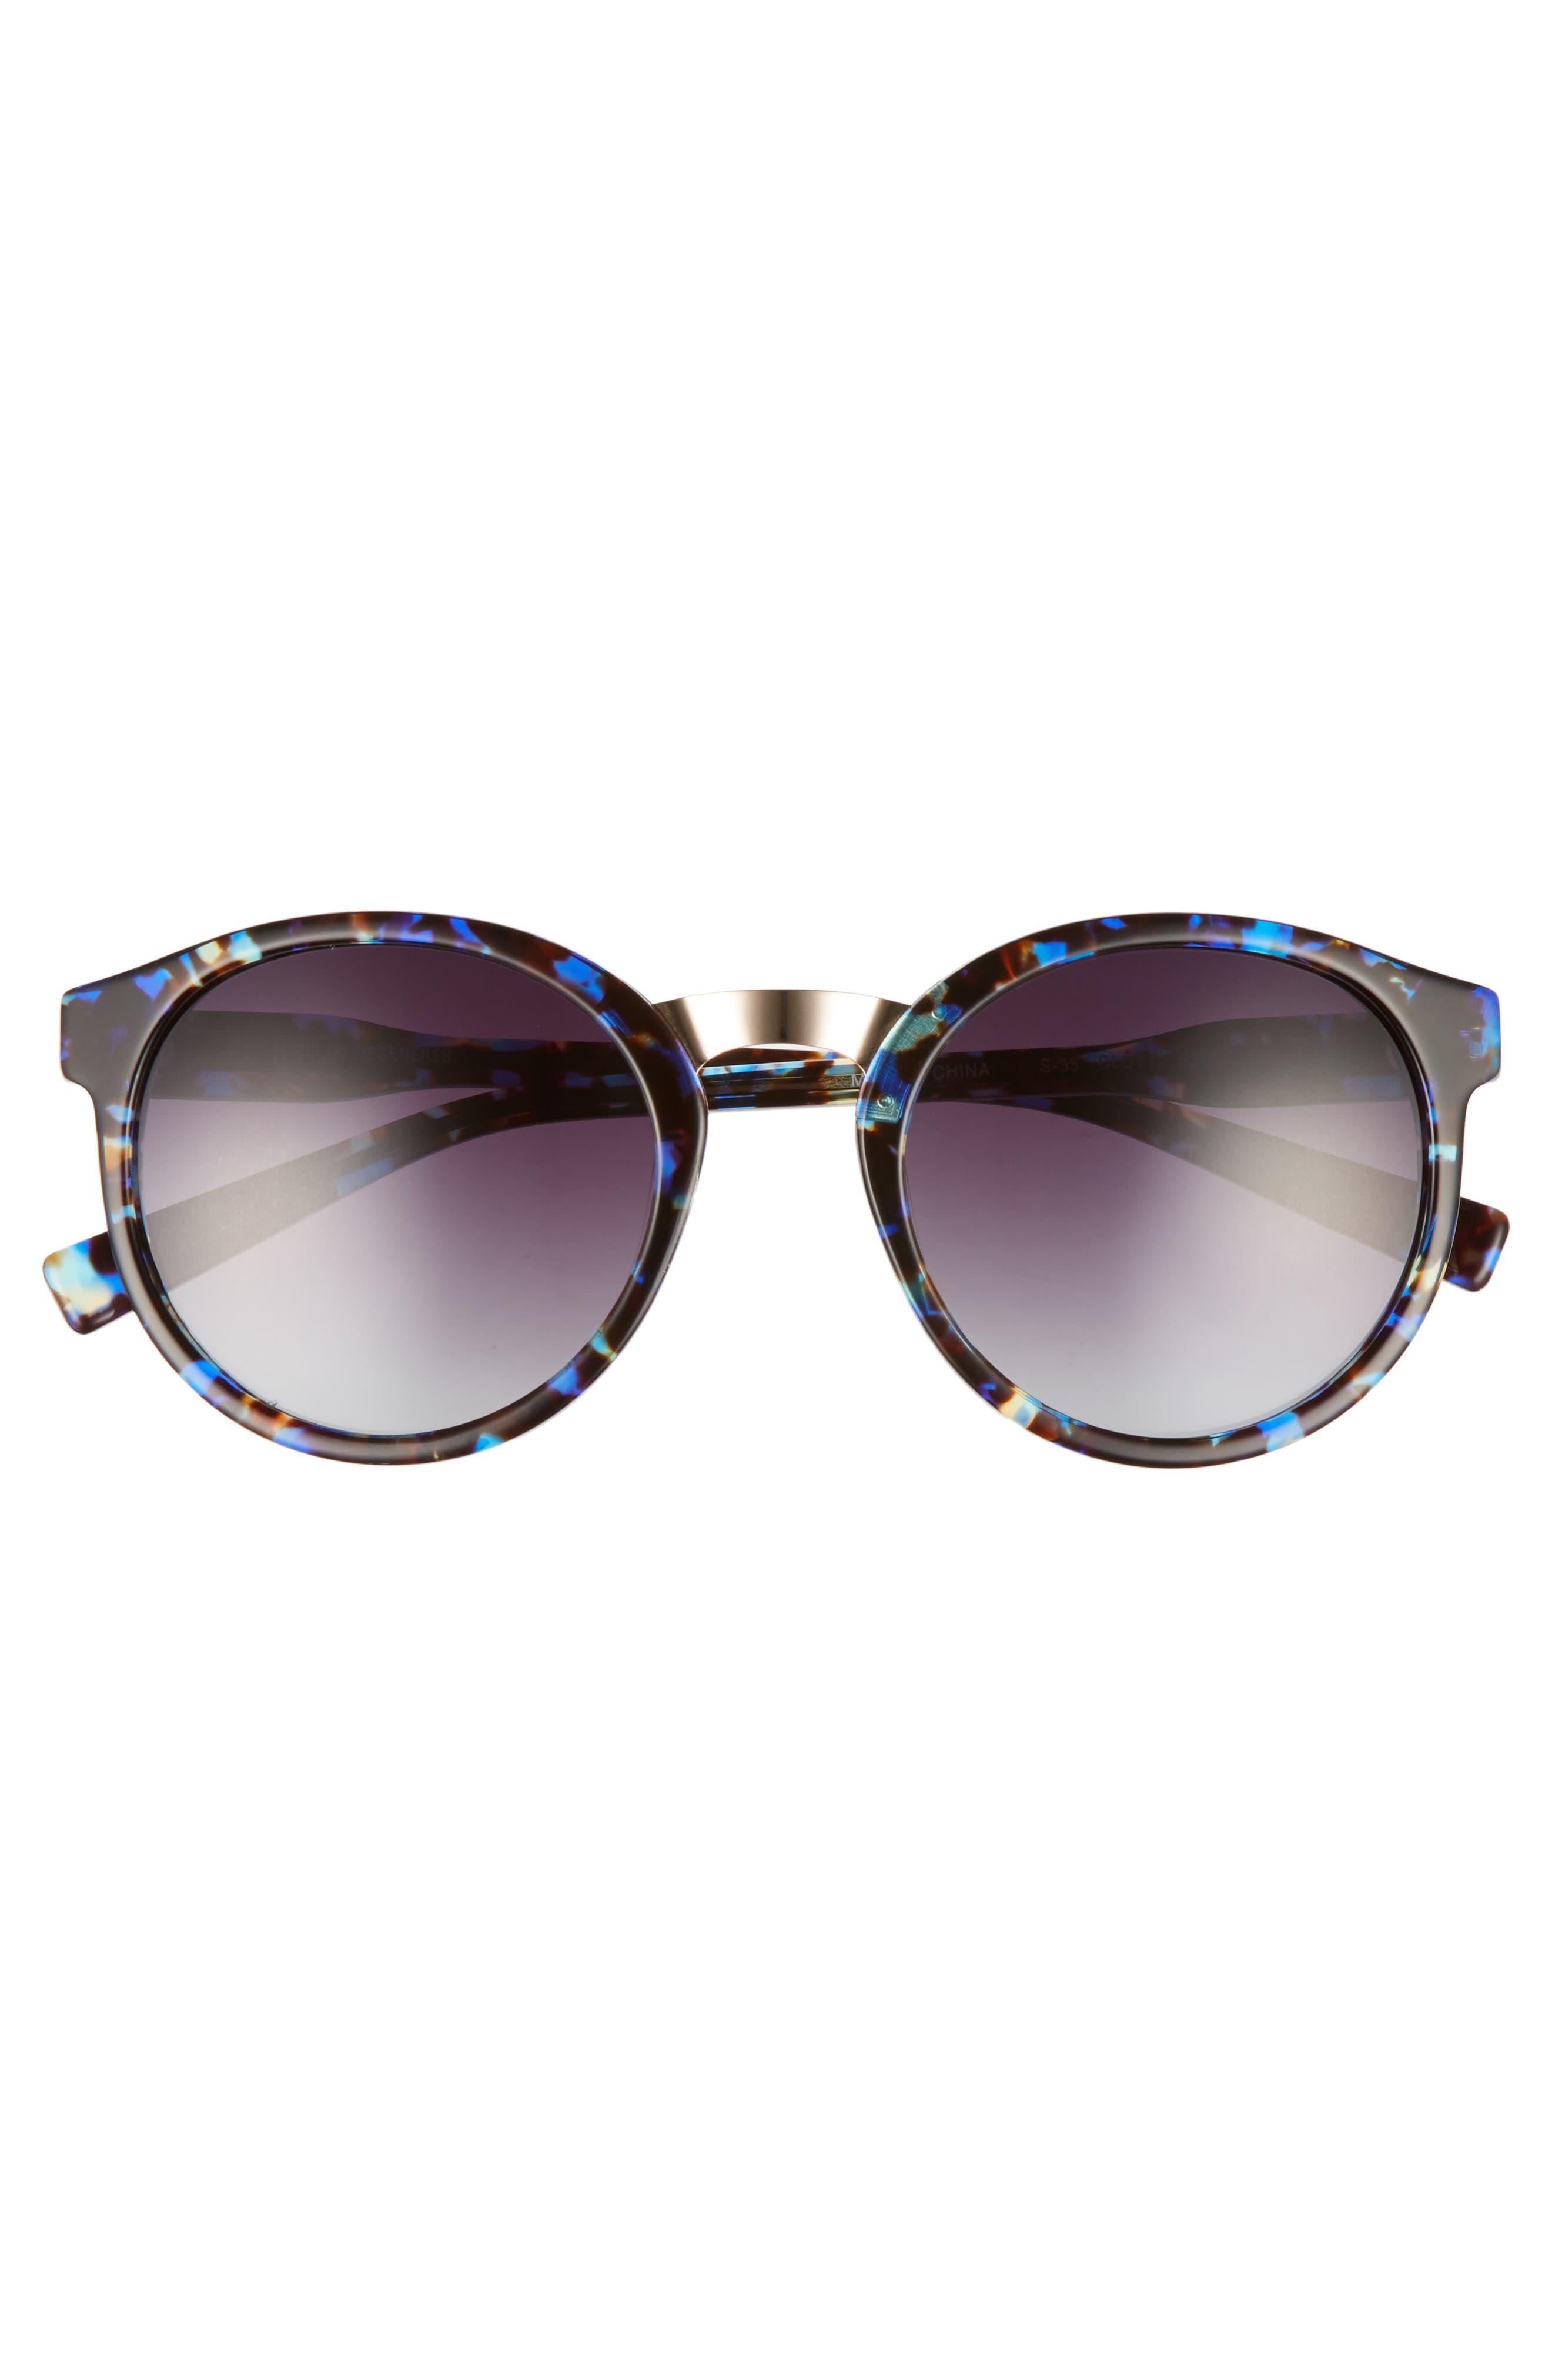 53mm Round Sunglasses,                             Alternate thumbnail 3, color,                             Blue Tortoise